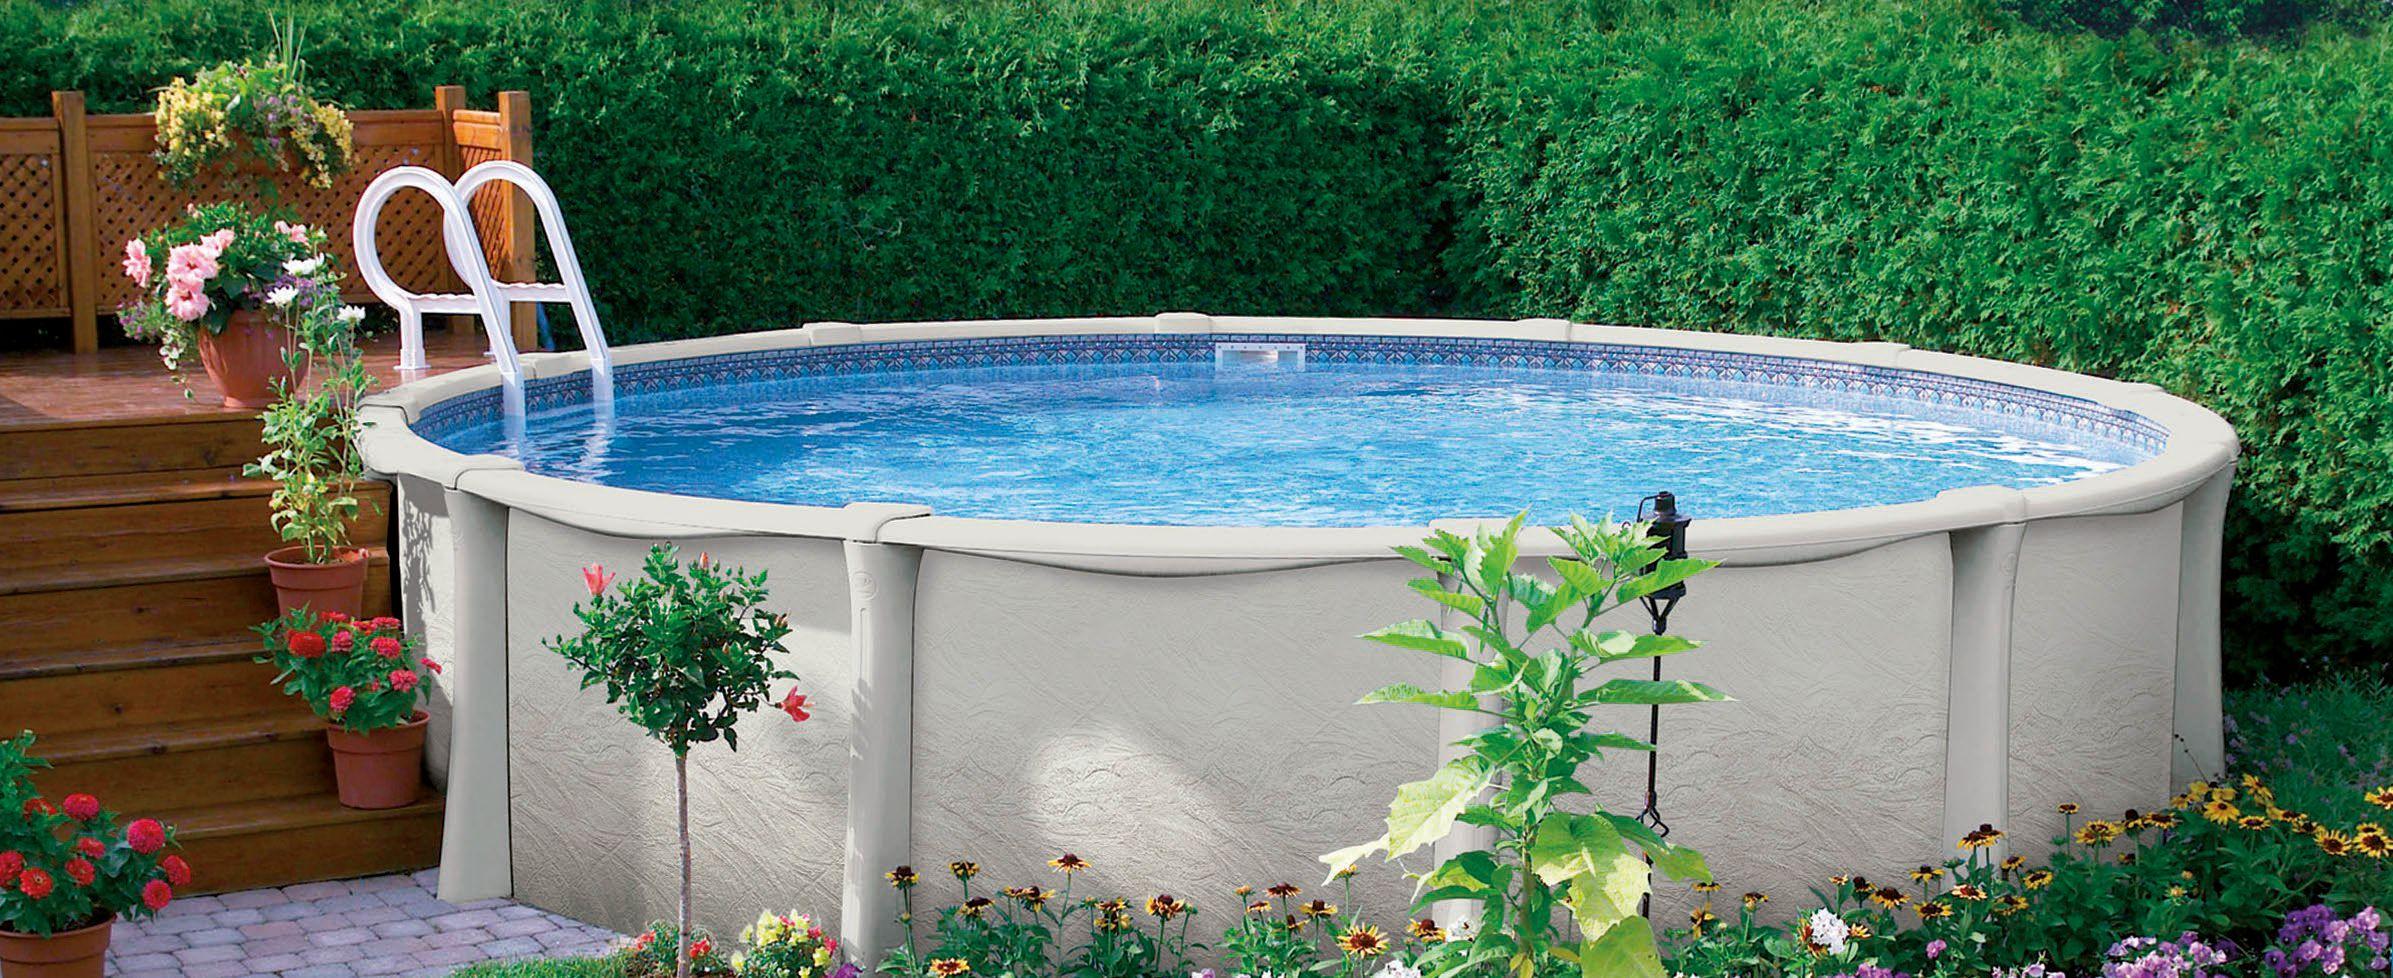 images piscine piscine polyester mozambique piscine daniel gilard william jezequel images. Black Bedroom Furniture Sets. Home Design Ideas